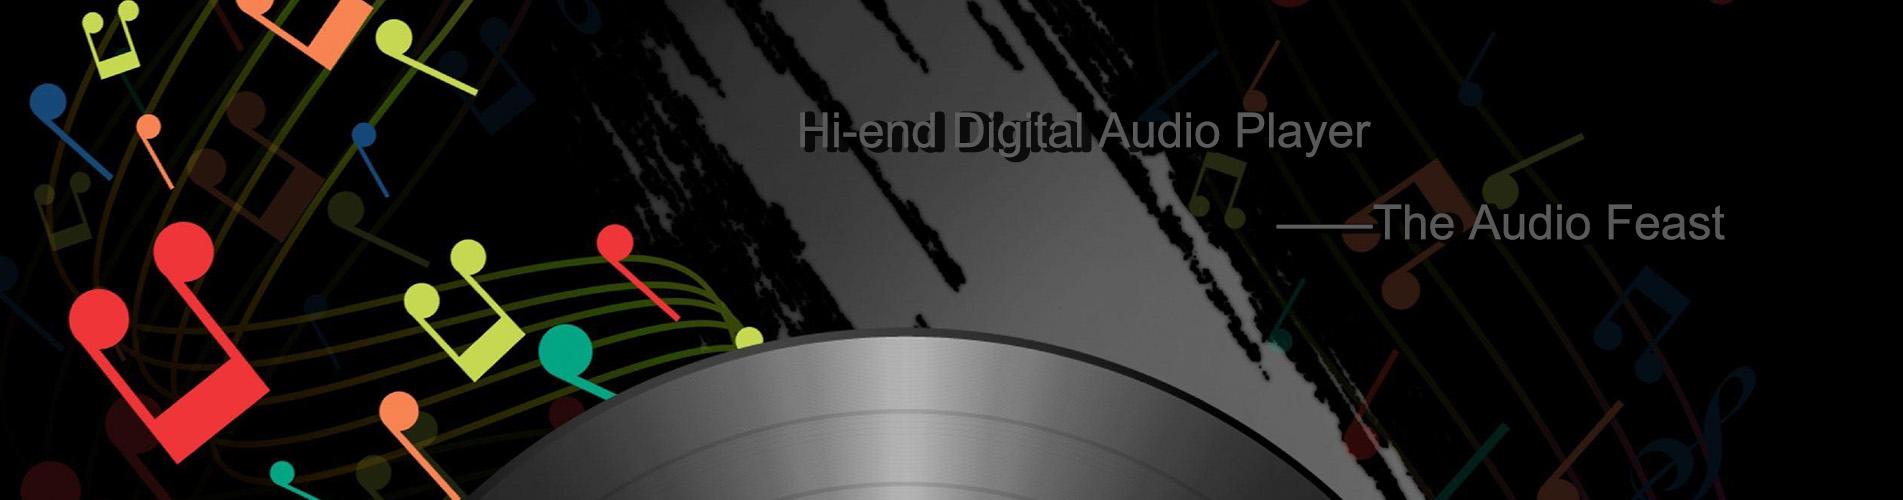 DSD-MQA-DIGITAL-AUDIO-PLAYER-DMP50